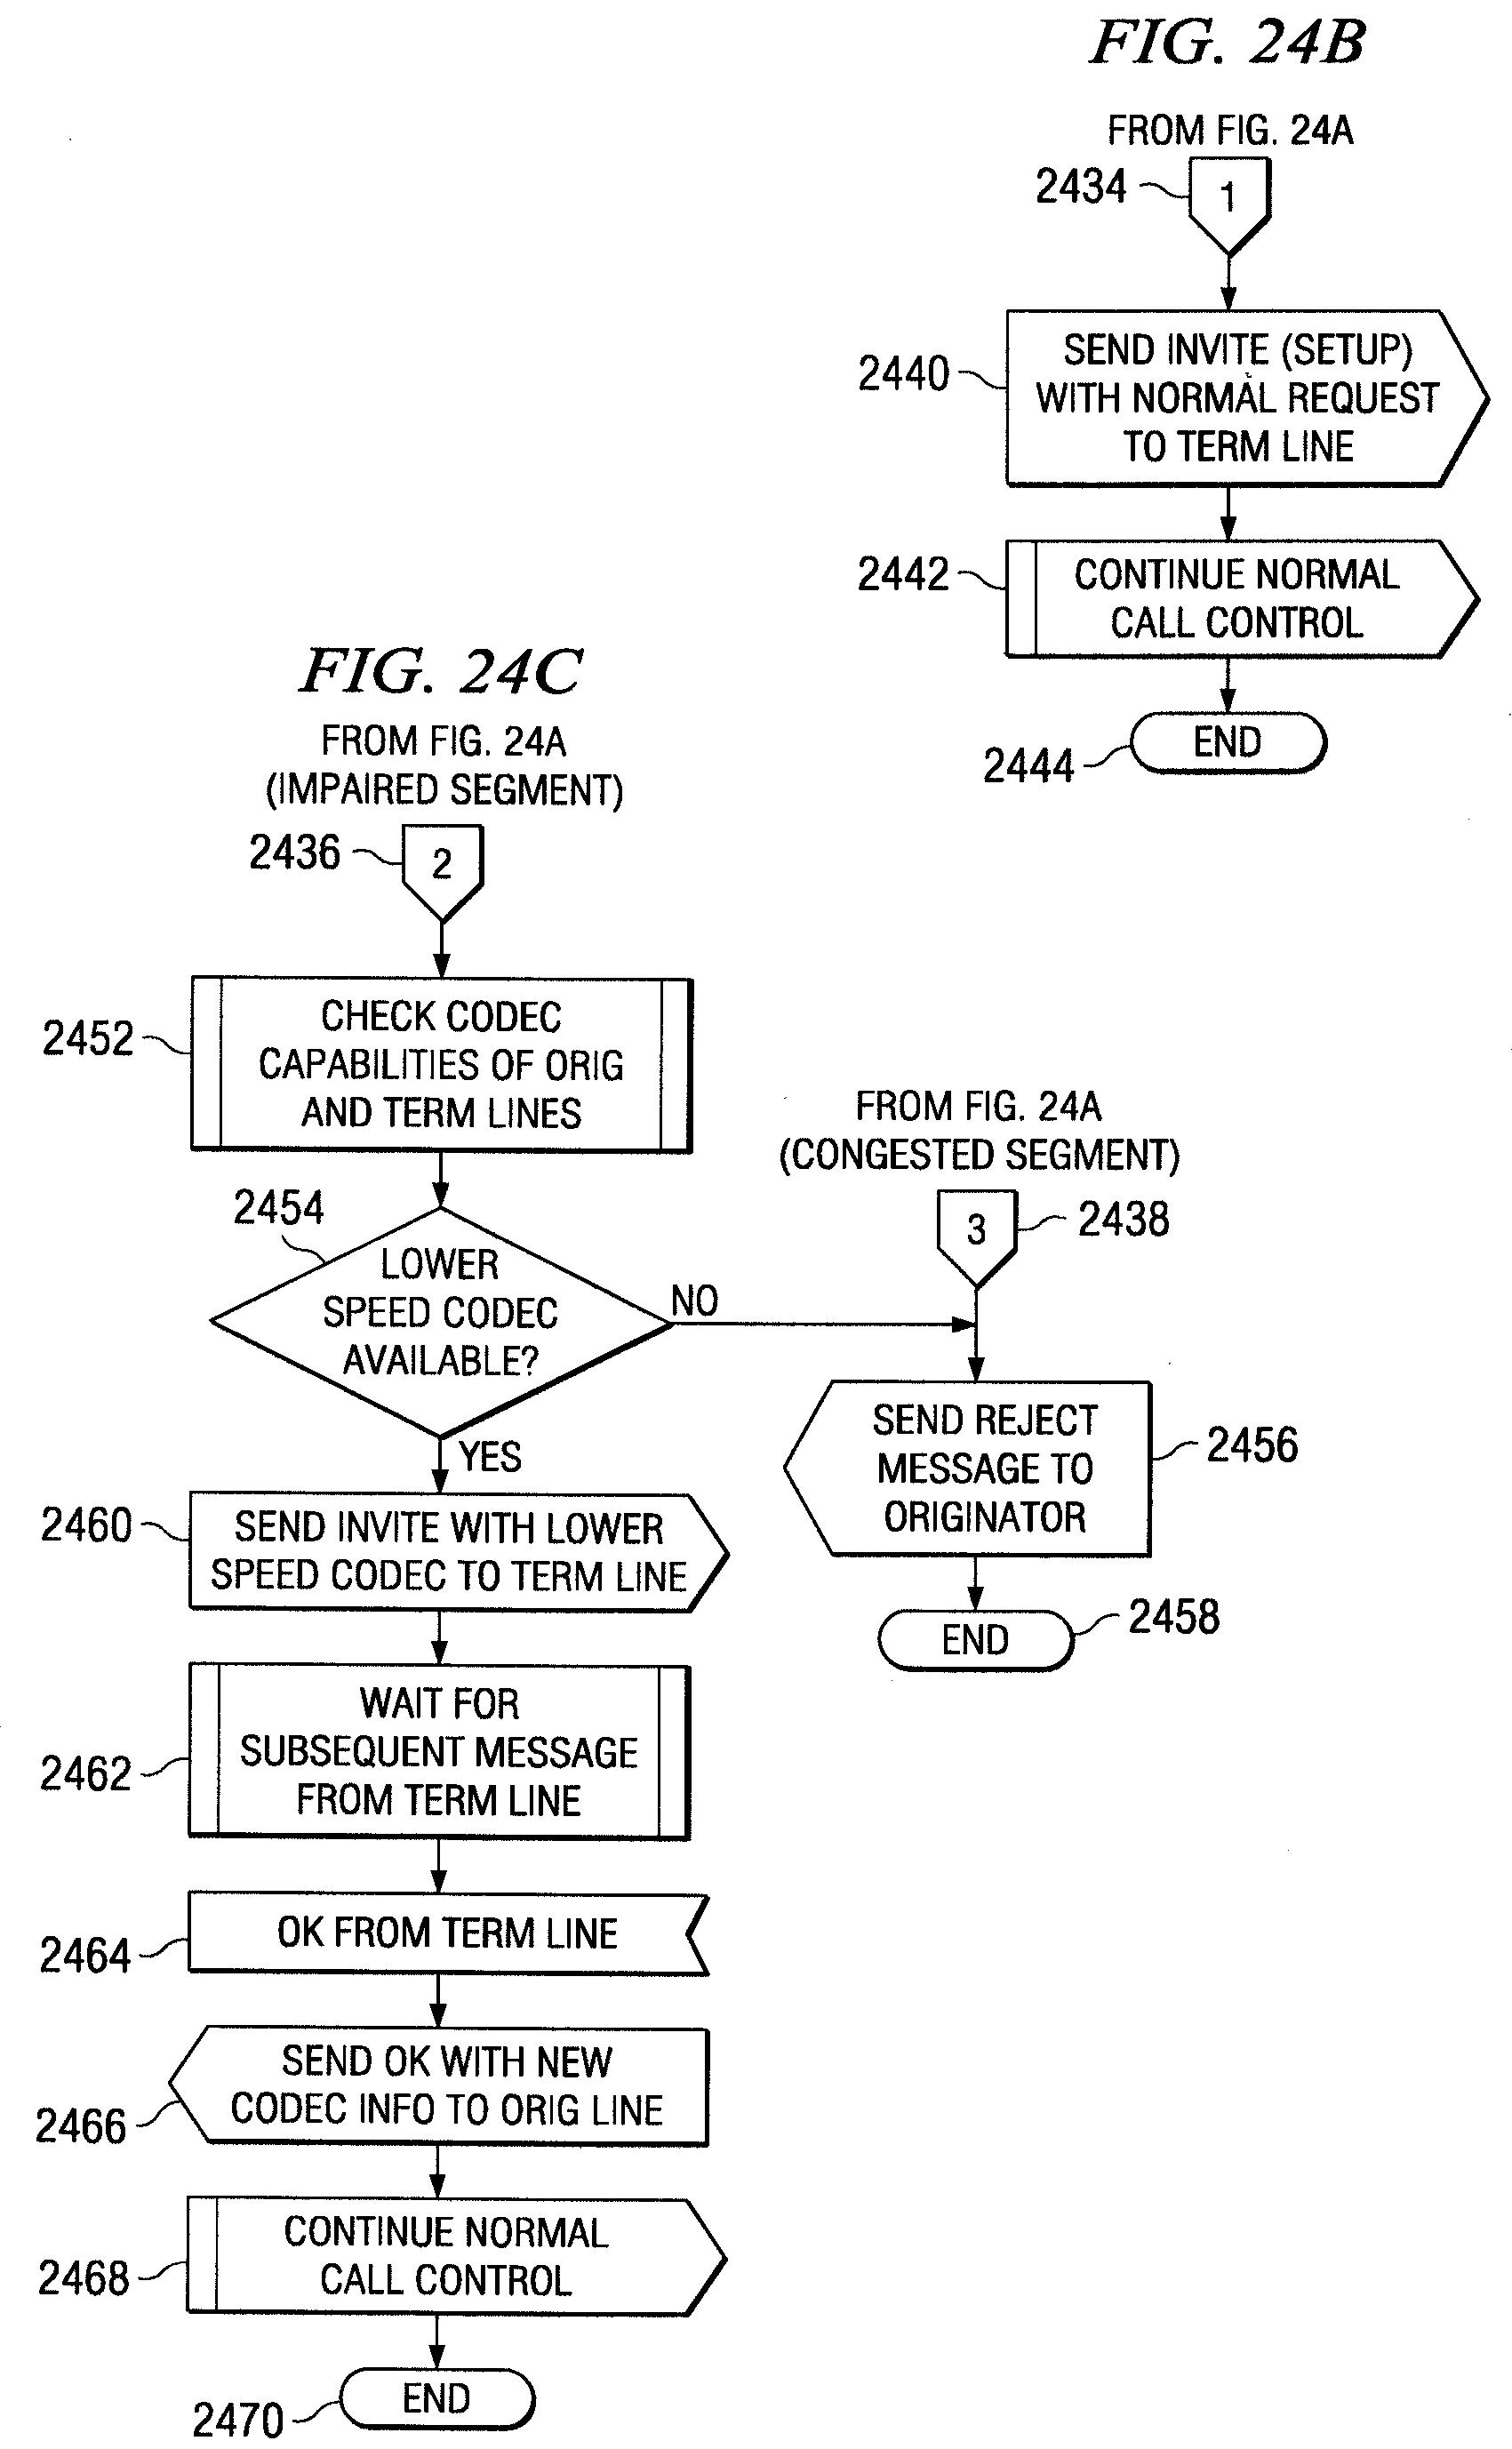 Patent US 8,358,580 B2